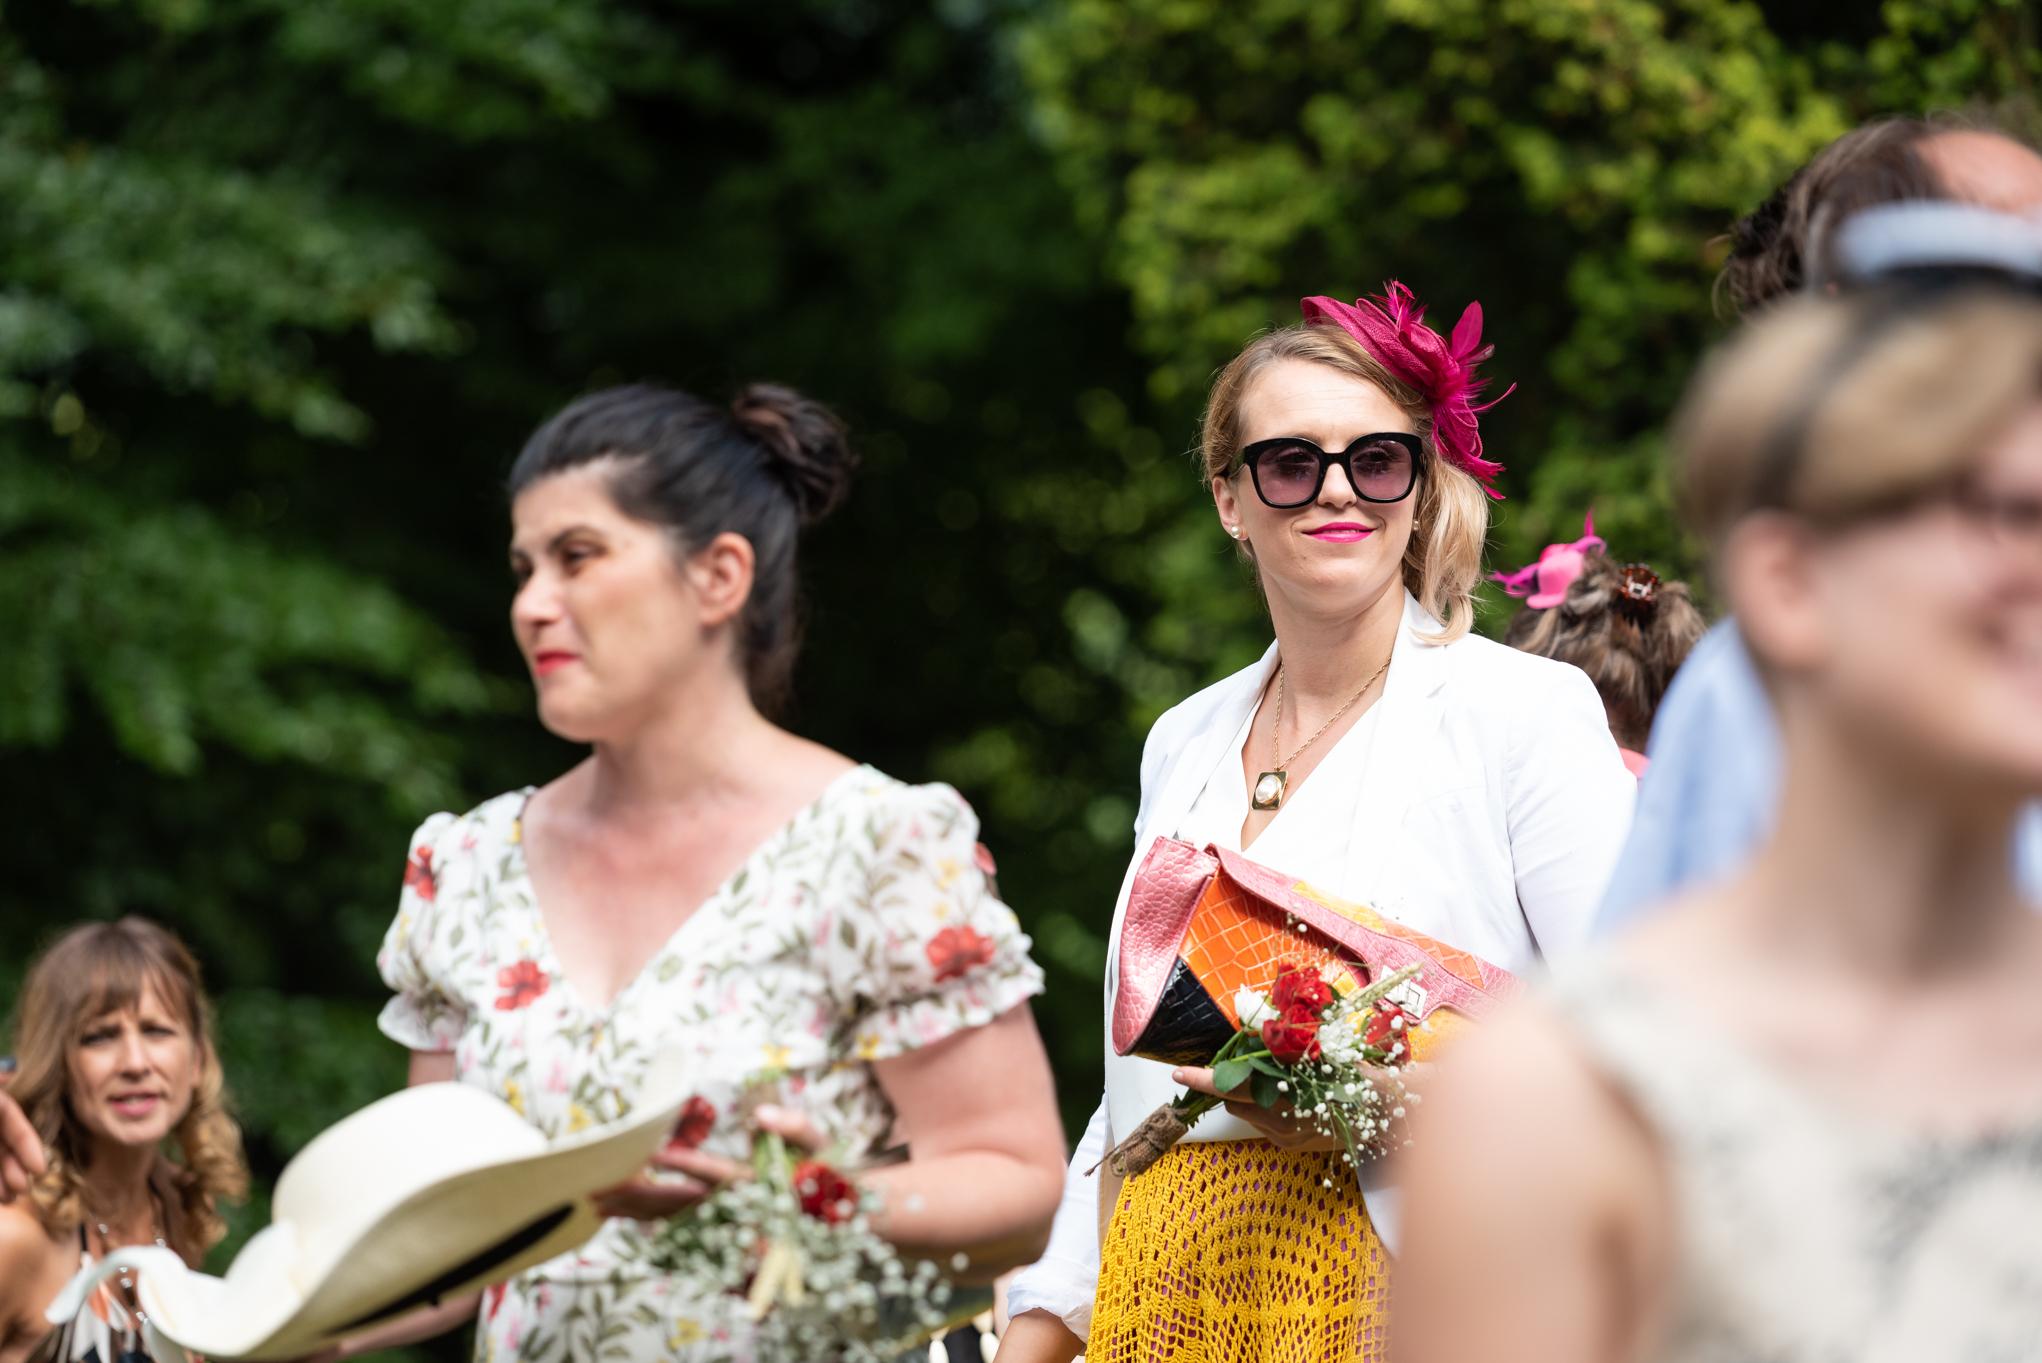 Copy of Wedding Guest